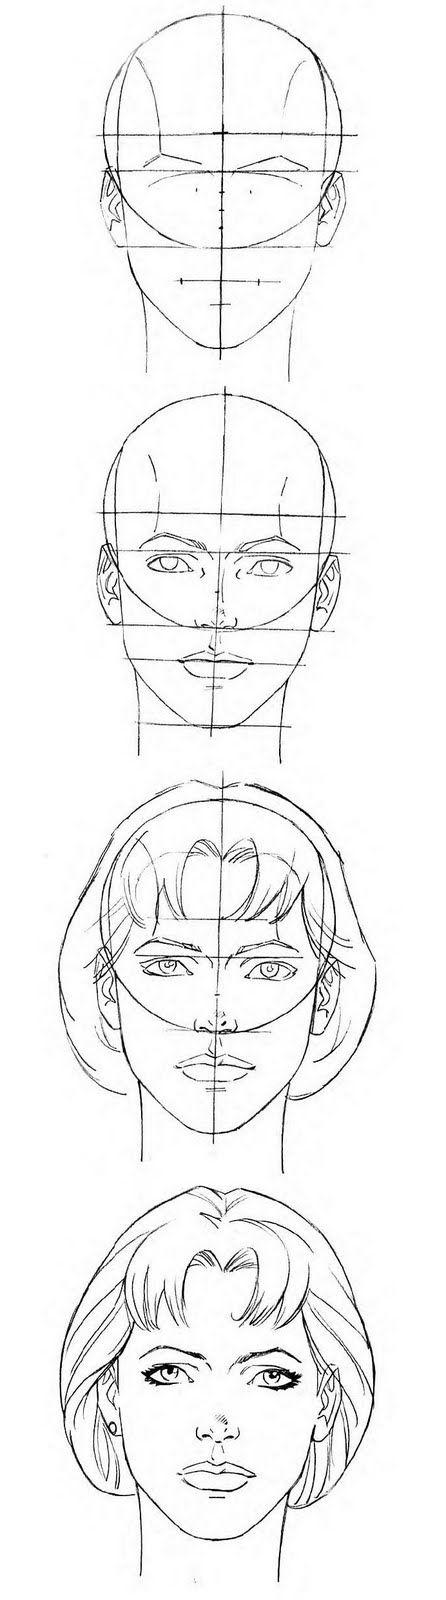 Female Head proportions template/reference // follow me on instagram: @itsjohnreid